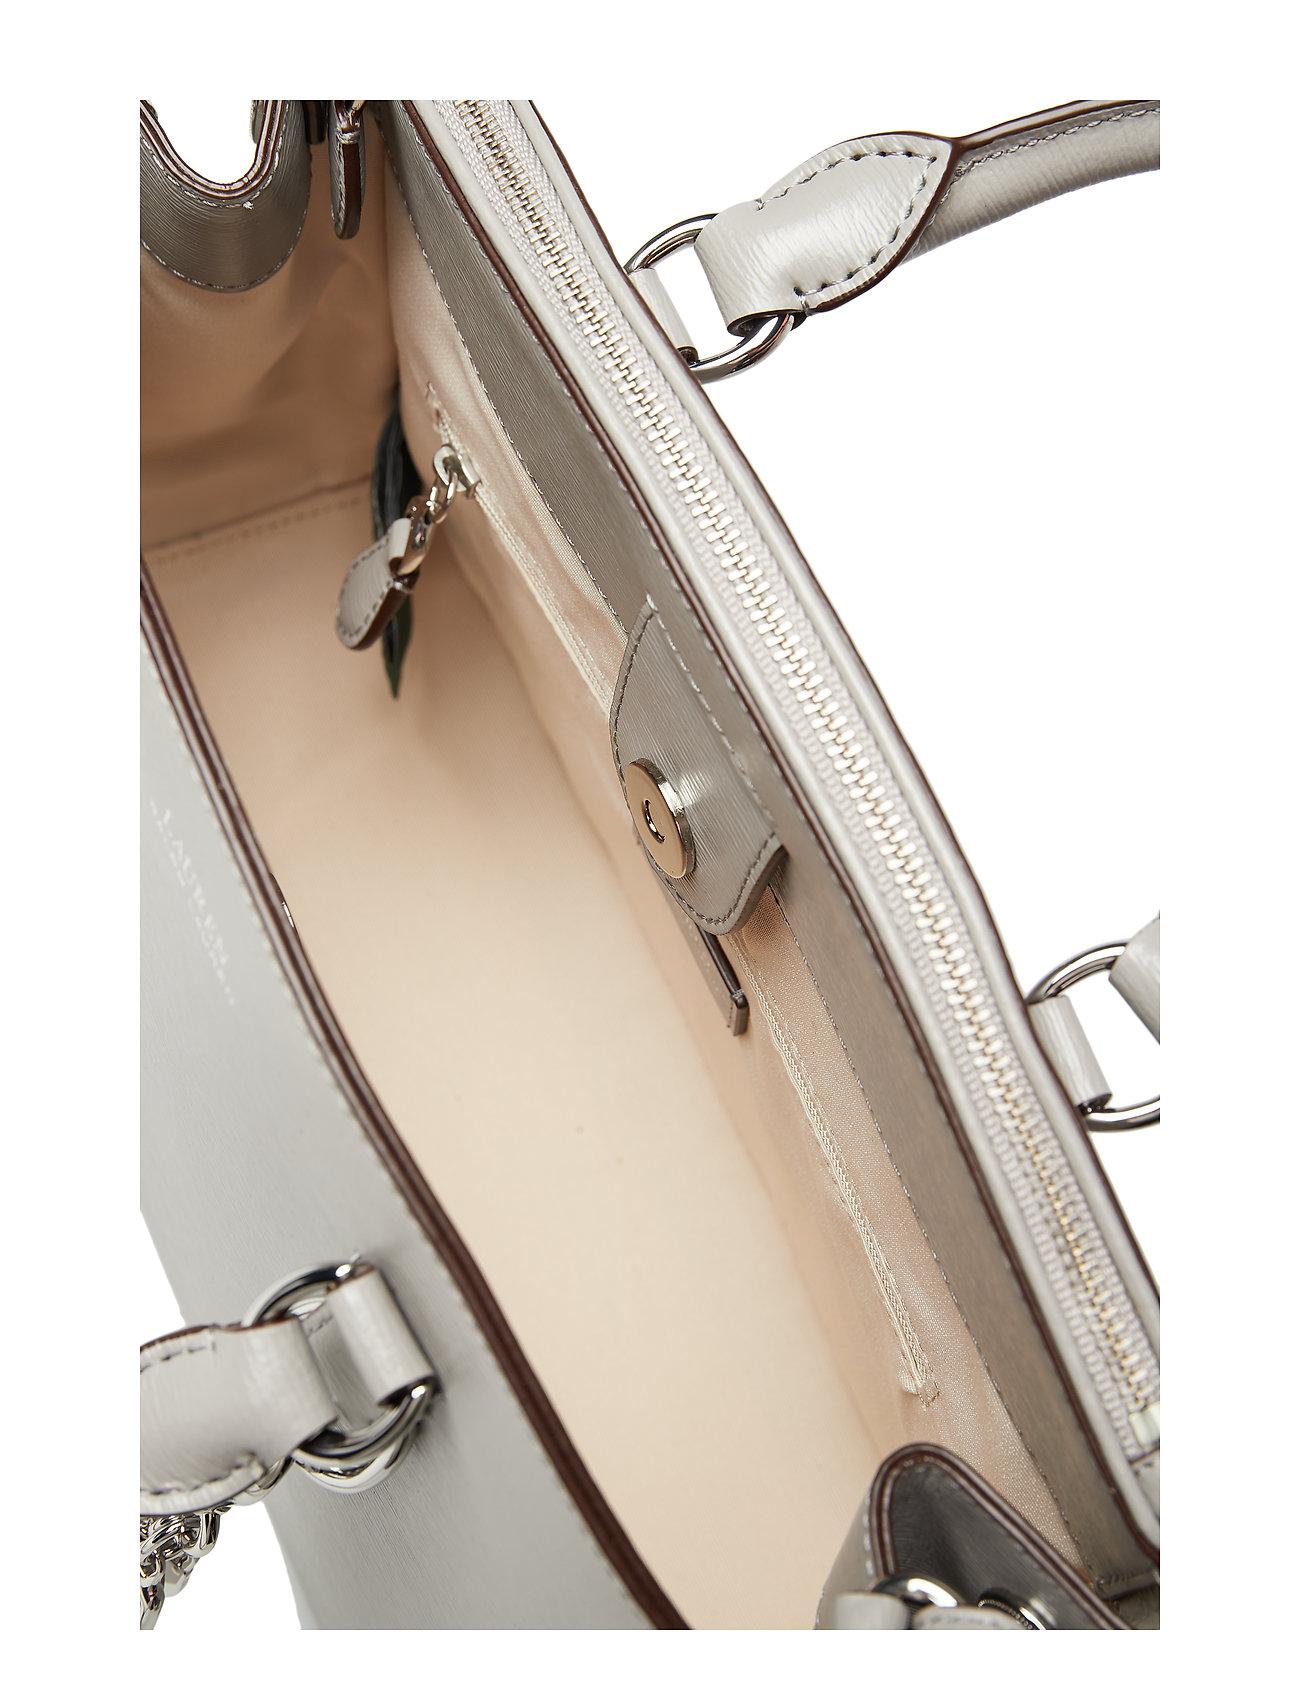 Mini Satcheldriver Saffiano GreyLauren Ralph Leather ynwvNm80O